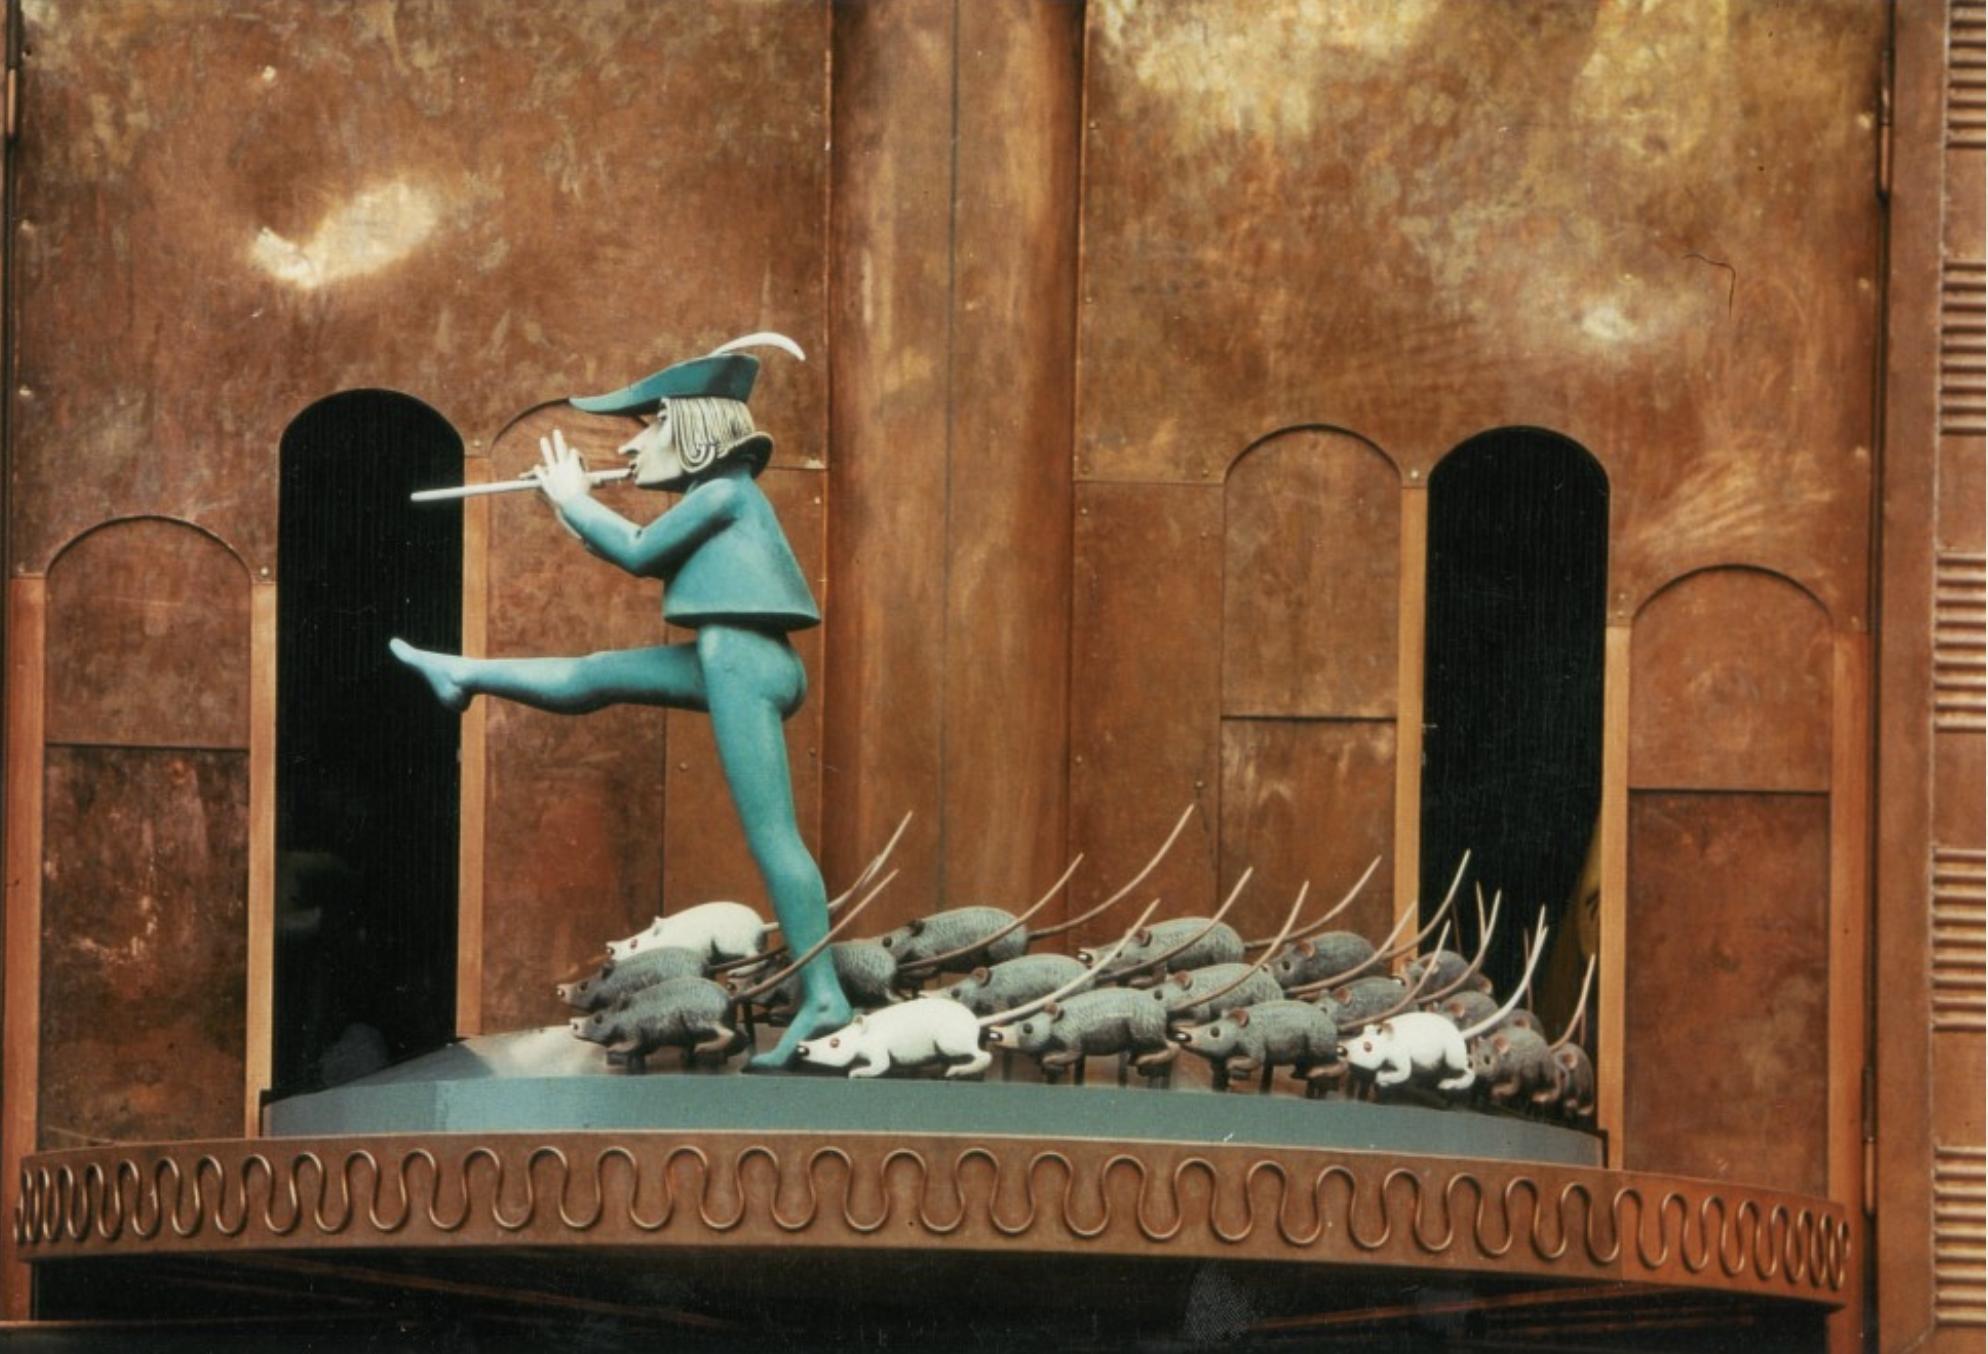 Hamelin hameln Germany Pied Piper Rattenfanger glockenspiel rats clock